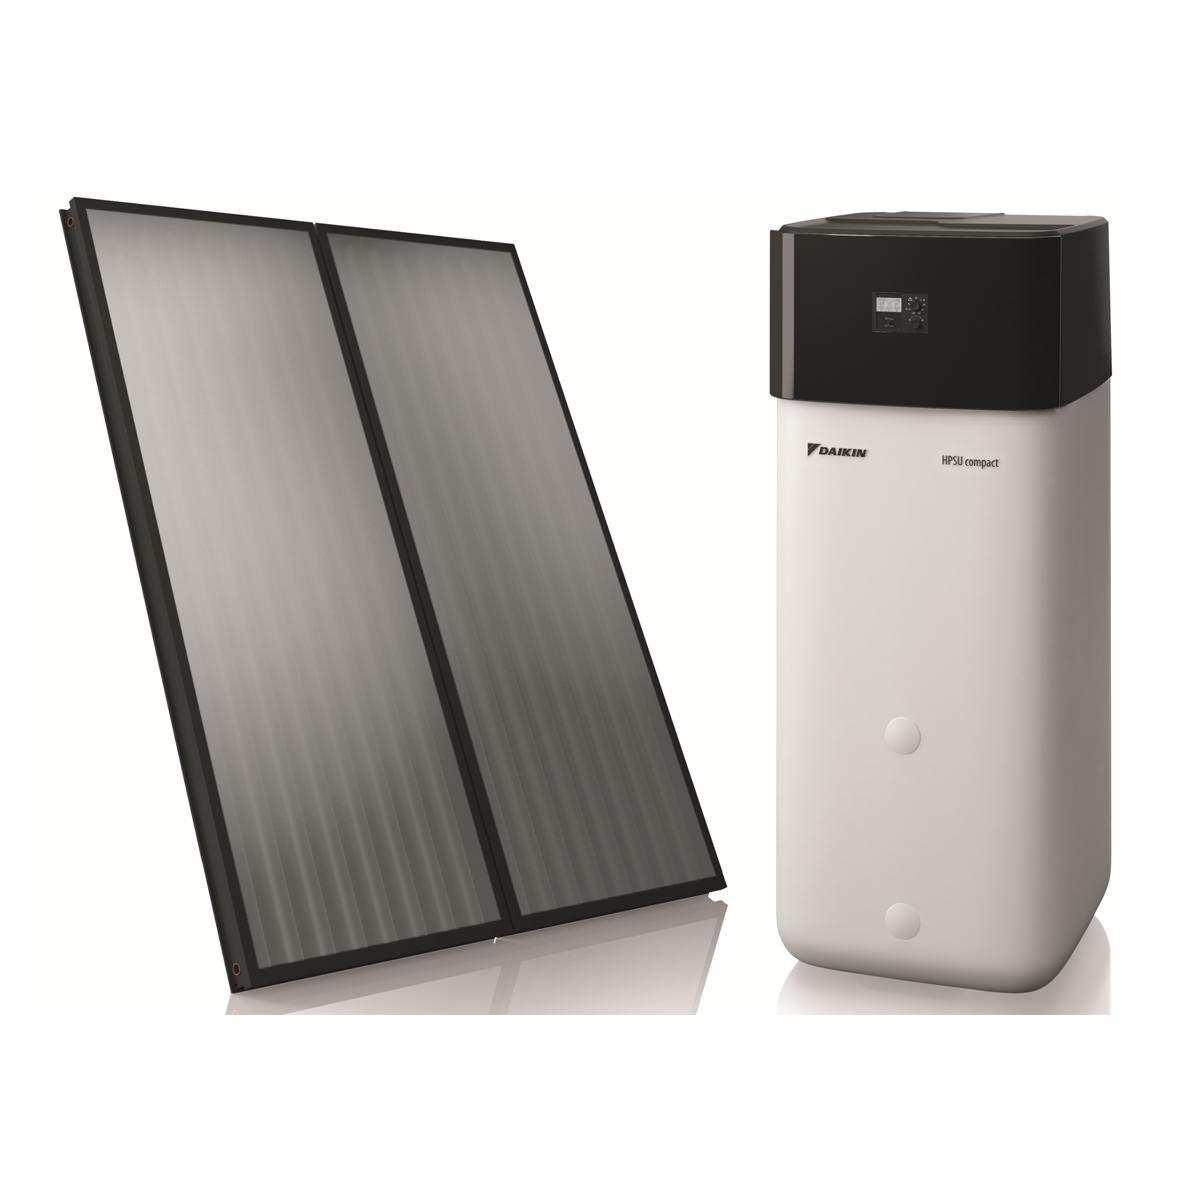 Climatizzatori per casa pompe di calore senza unit esterna for Caldaie di ultima generazione prezzi